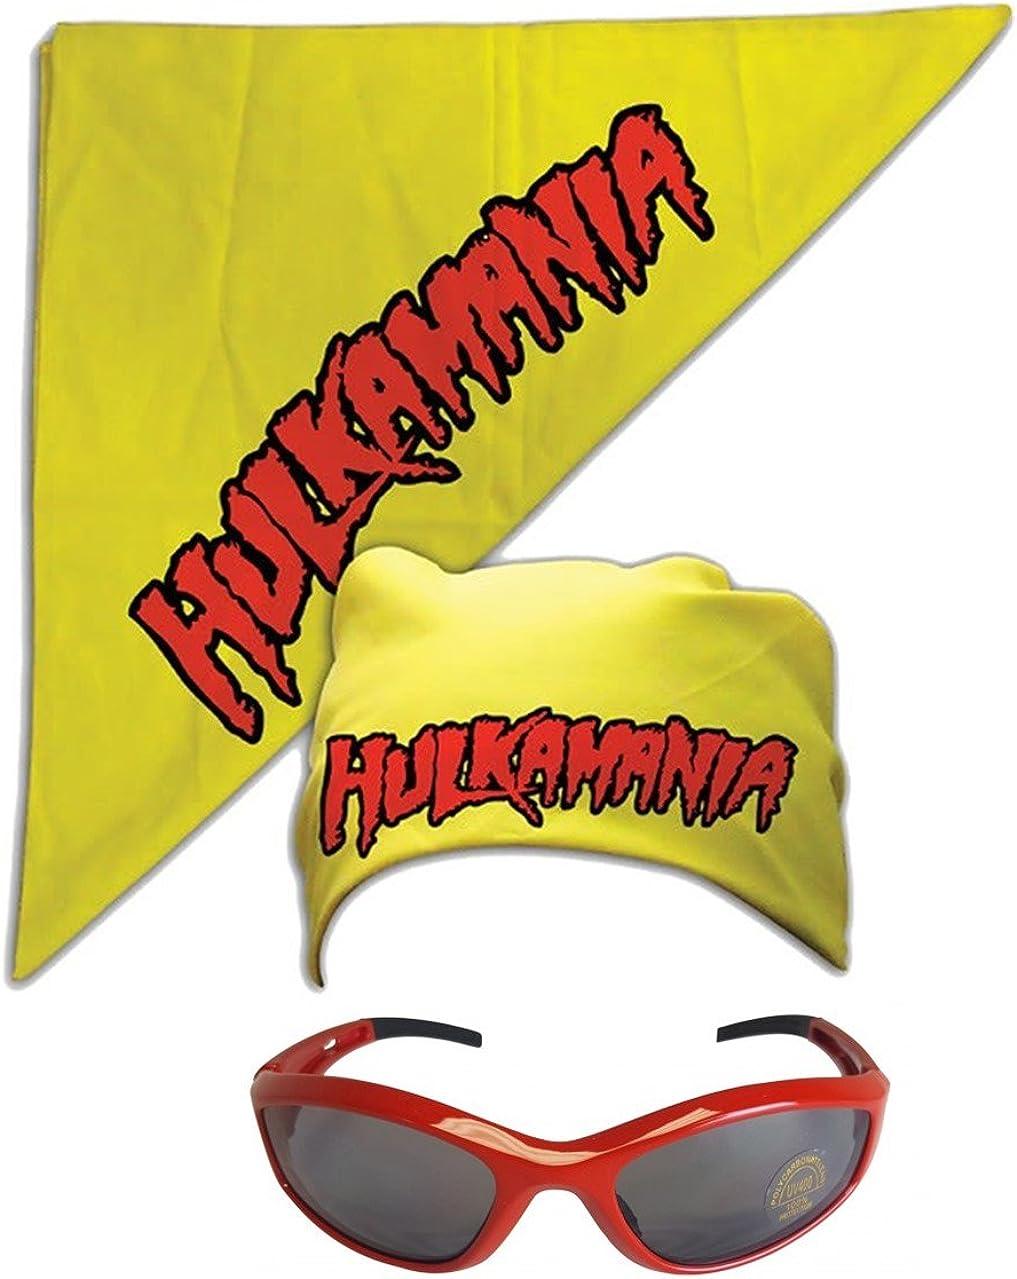 Hulk Hogan Hulkamania Bandana -Yellow-Red Sunglasses Costume Outlet sale feature Large special price !!